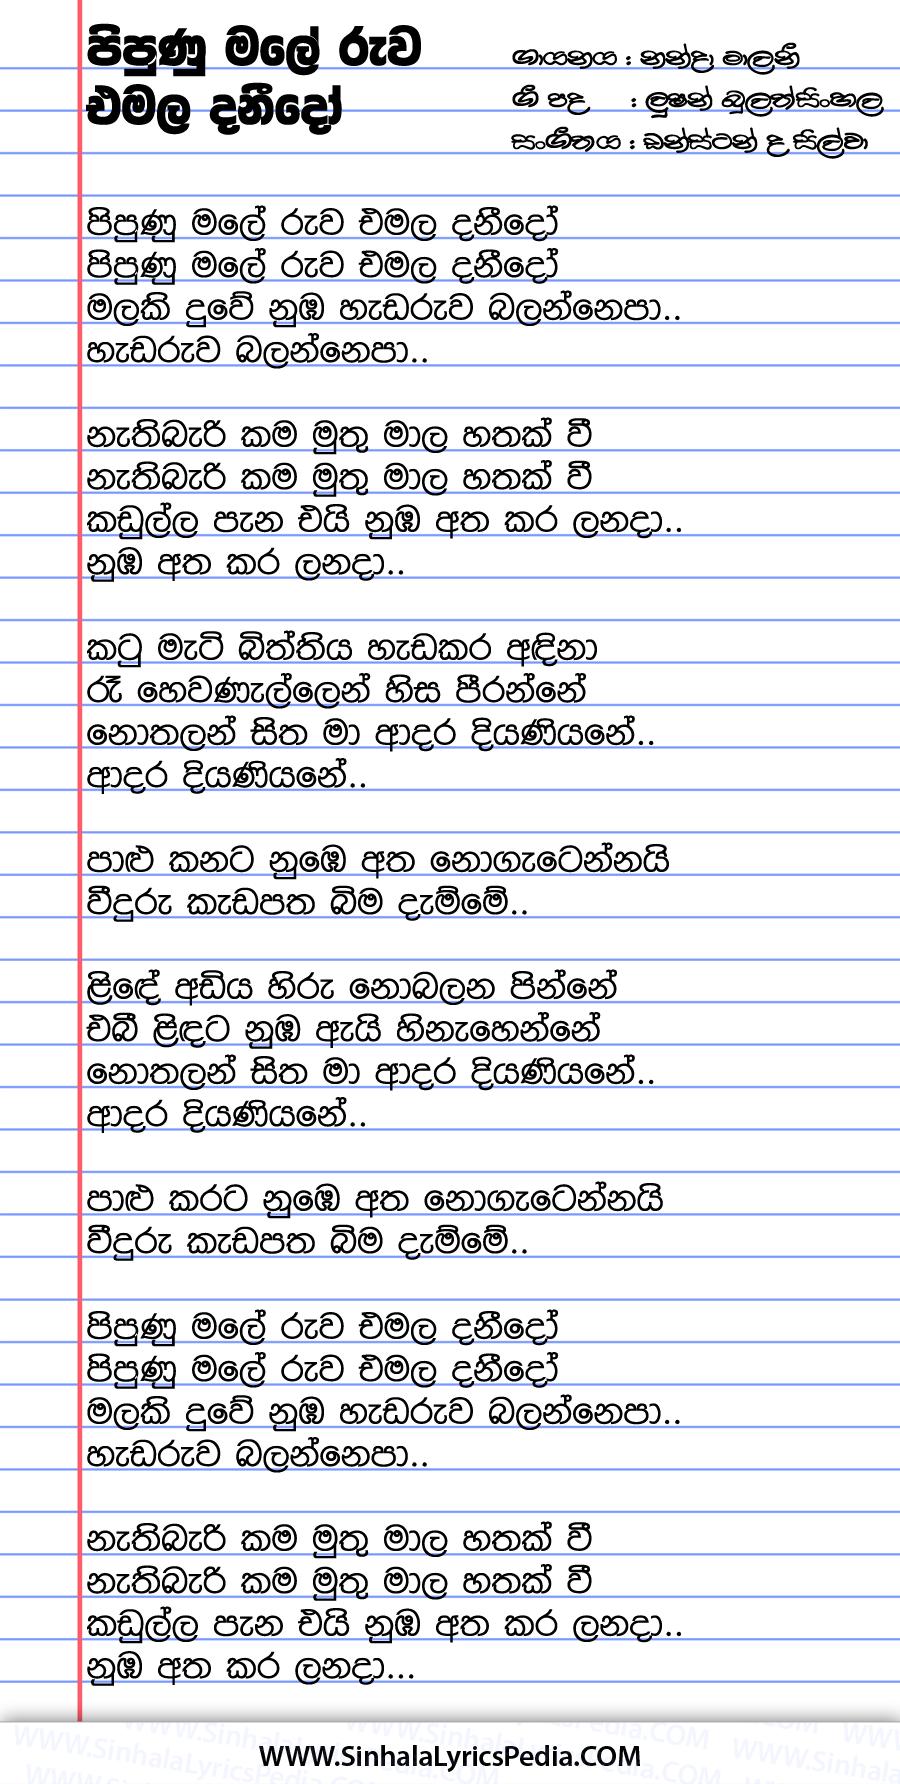 Pipunu Male Ruwa Emala Danido Song Lyrics